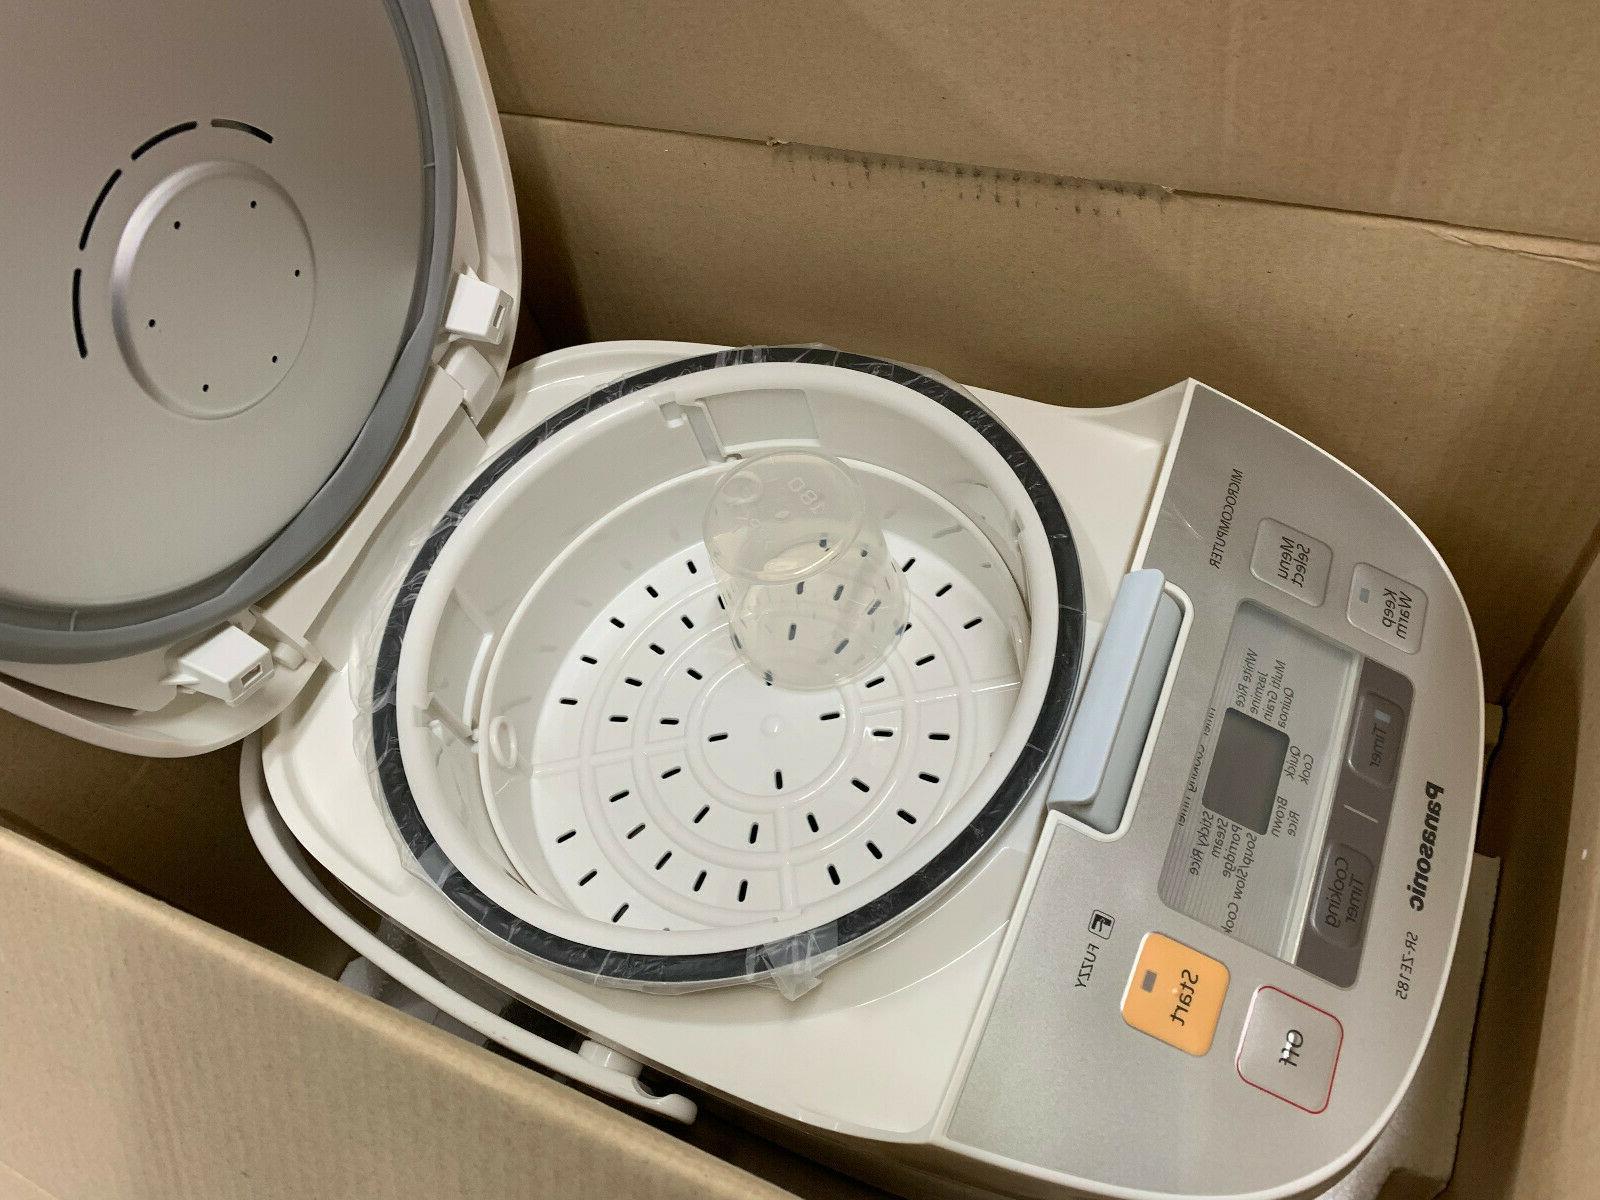 Panasonic SR-ZE185 10 Micom Cups cooked new